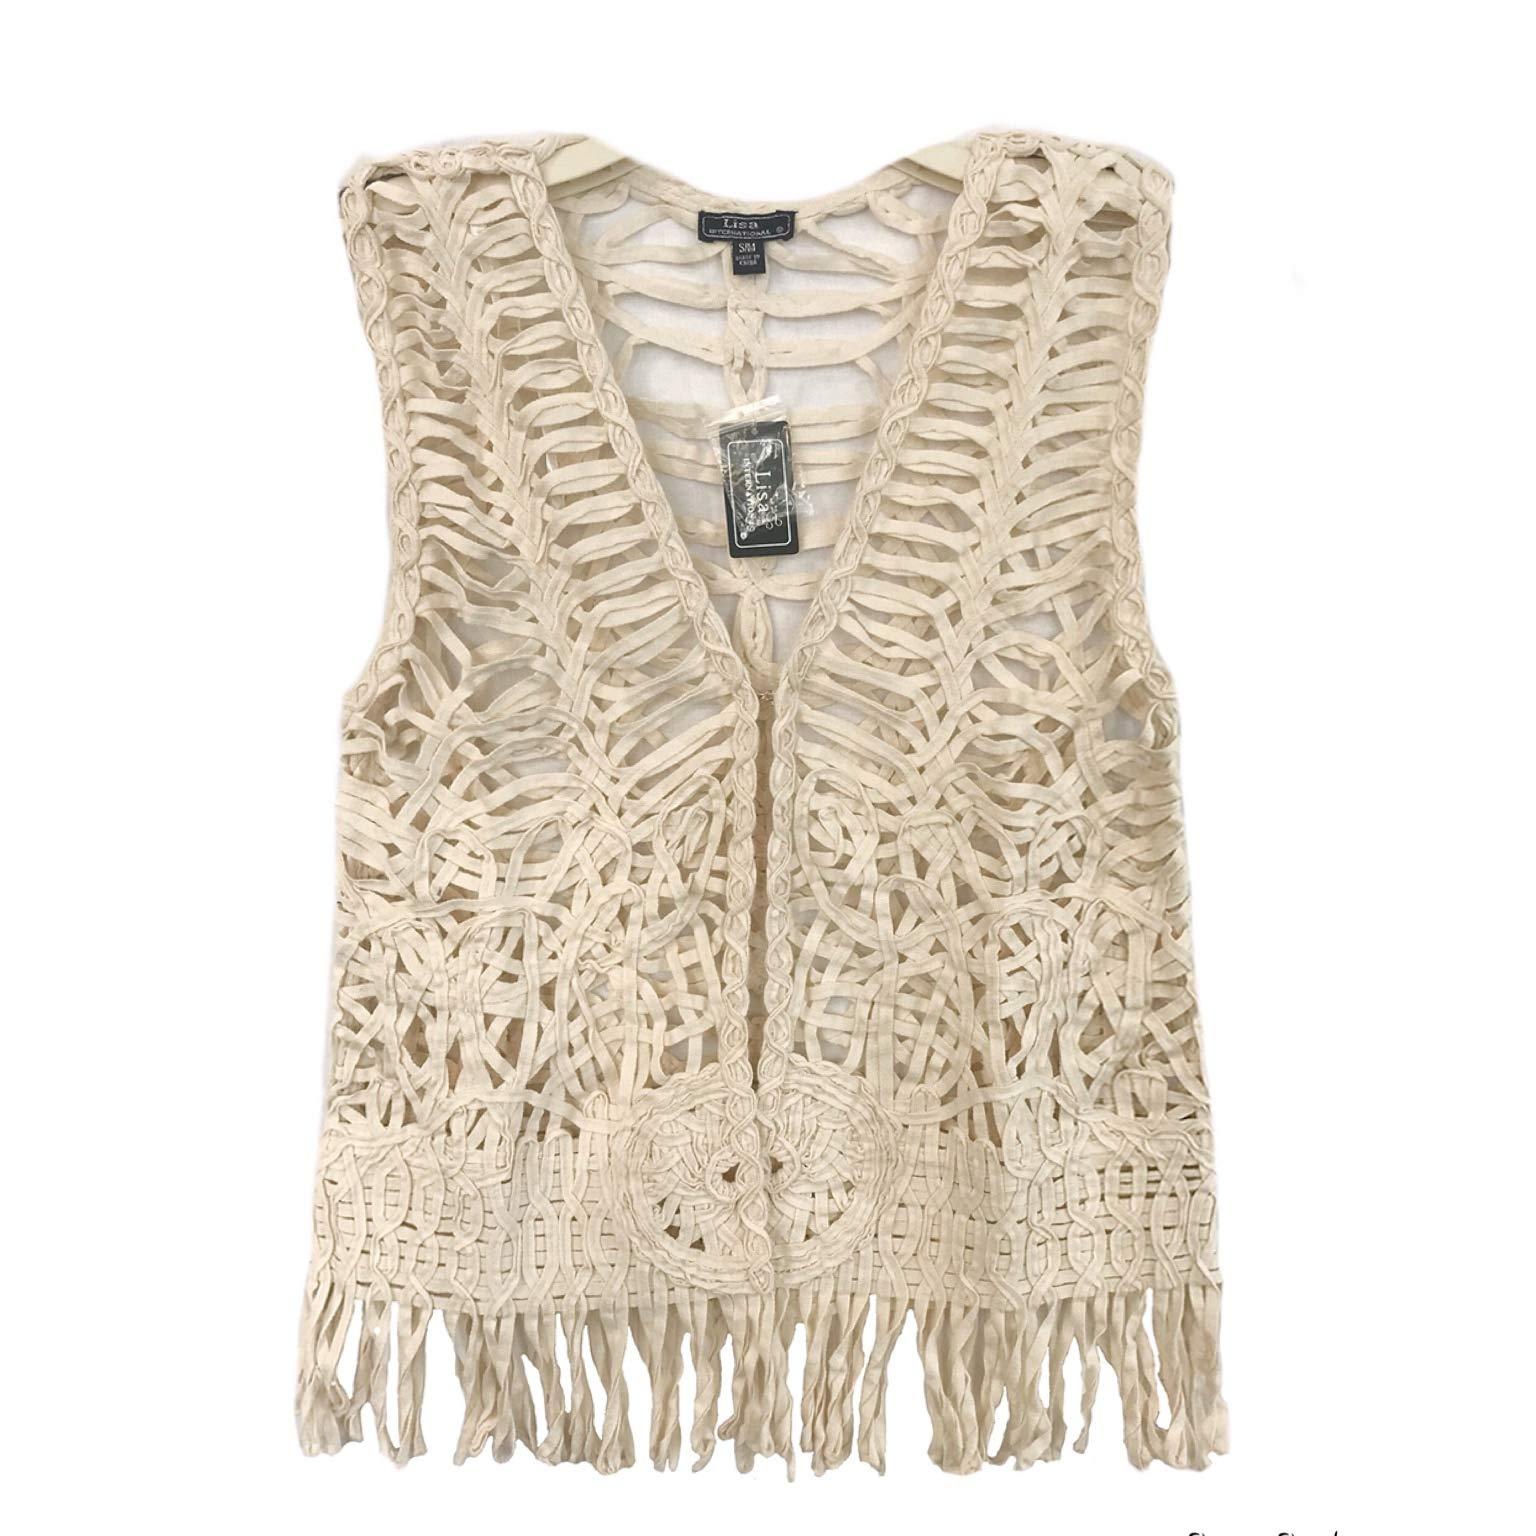 Lisa International Women's Boho Hippie Vest with Long Fringe 100% Cotton/Summer Bikini Cover (S/M, 6789-Ivory)